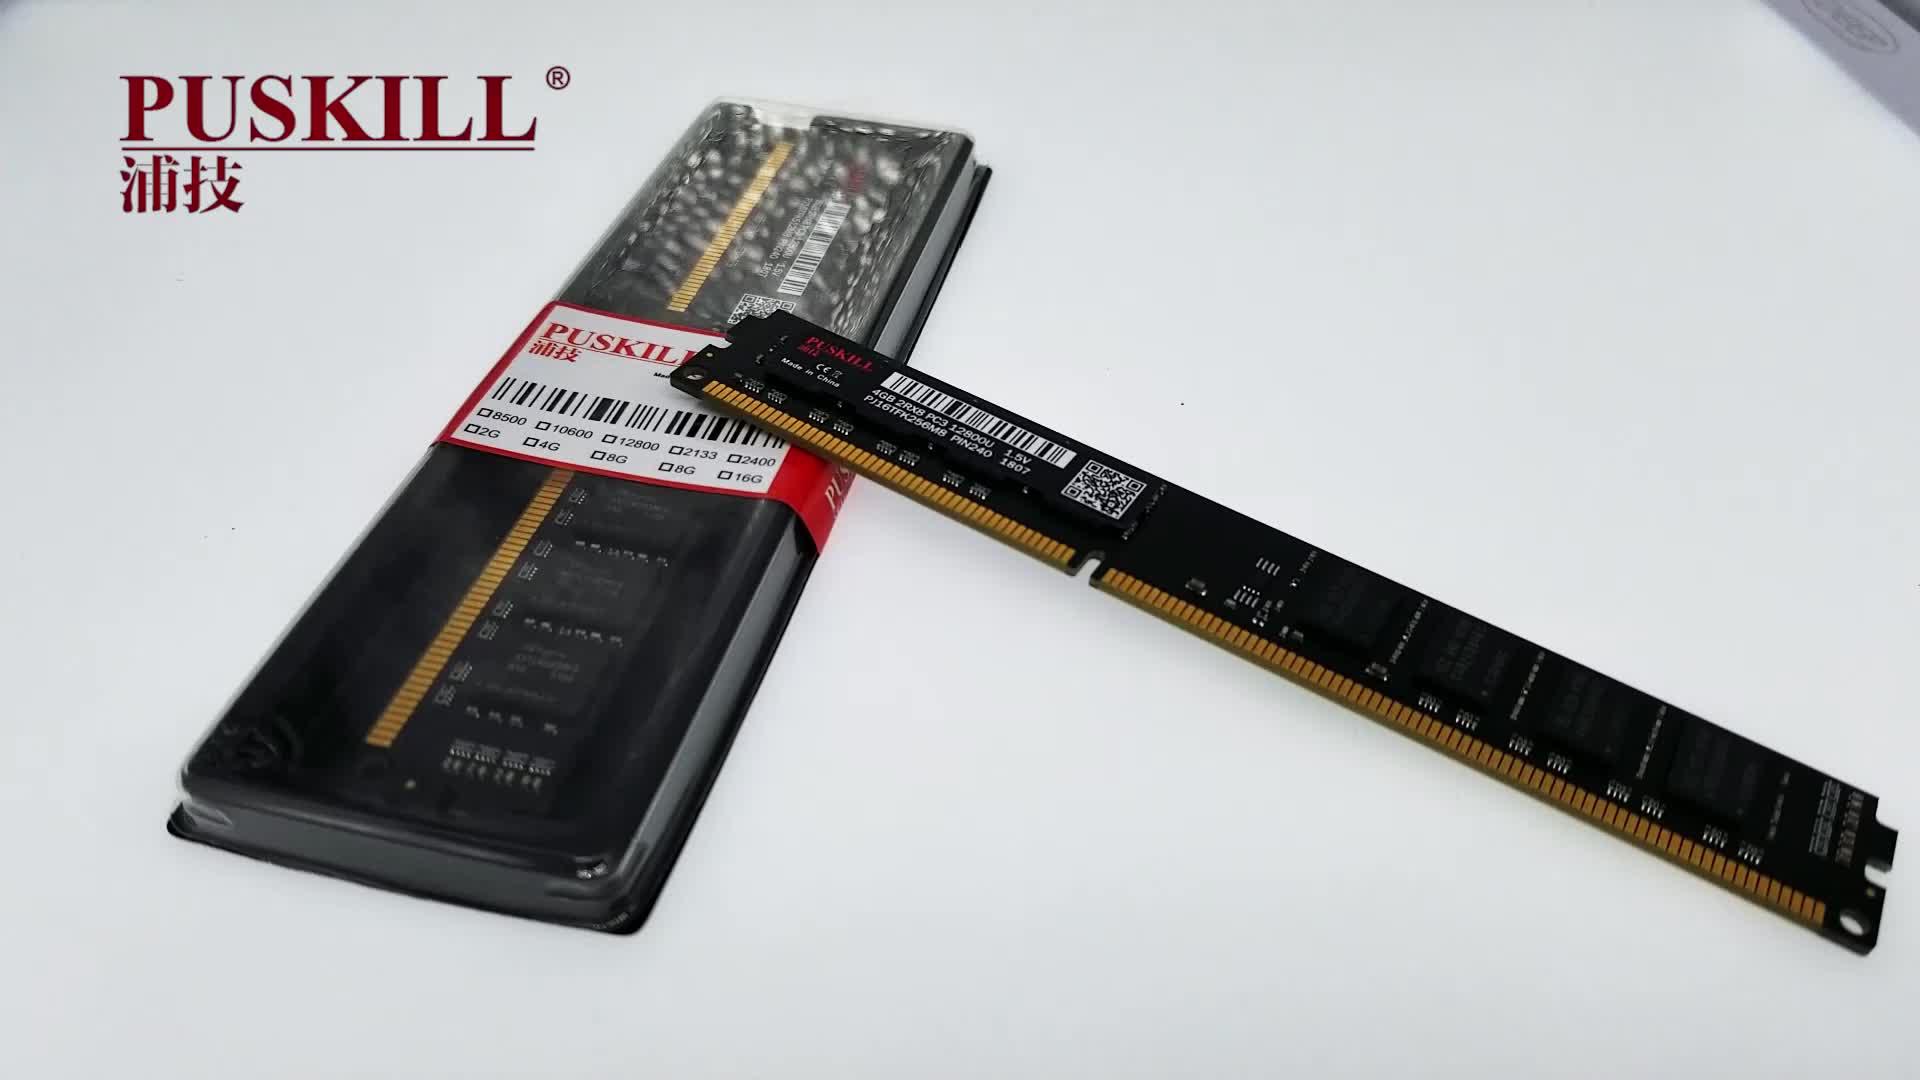 DDR3 ギガバイト 4 1600 mhz デスクトップのメモリ Ram コンピュータ